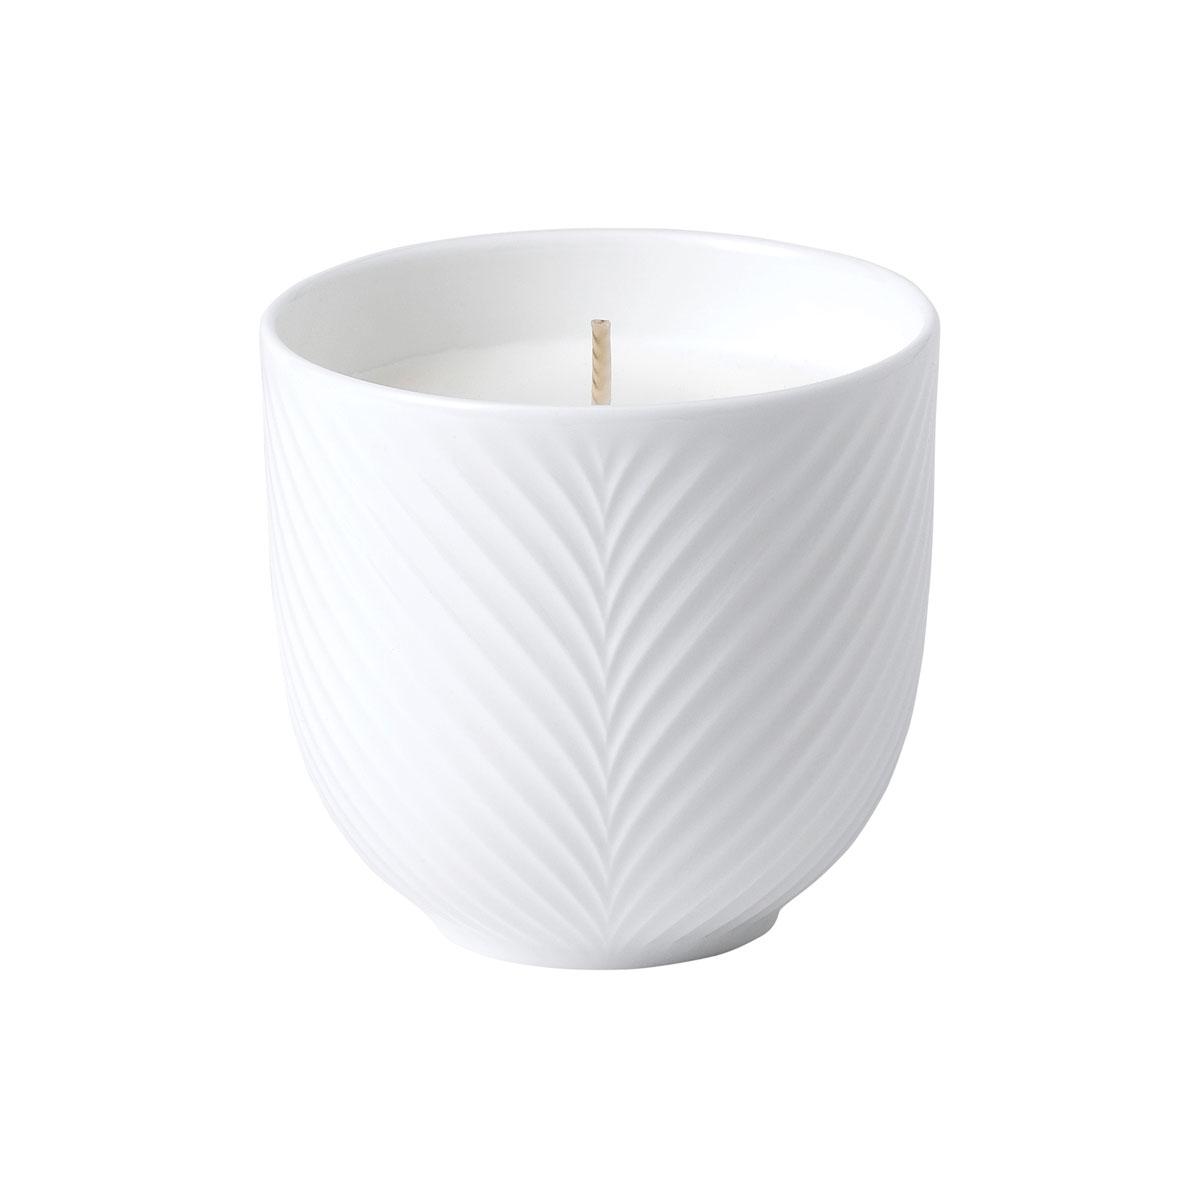 Wedgwood White Folia Candle, Bamboo and Green Tea